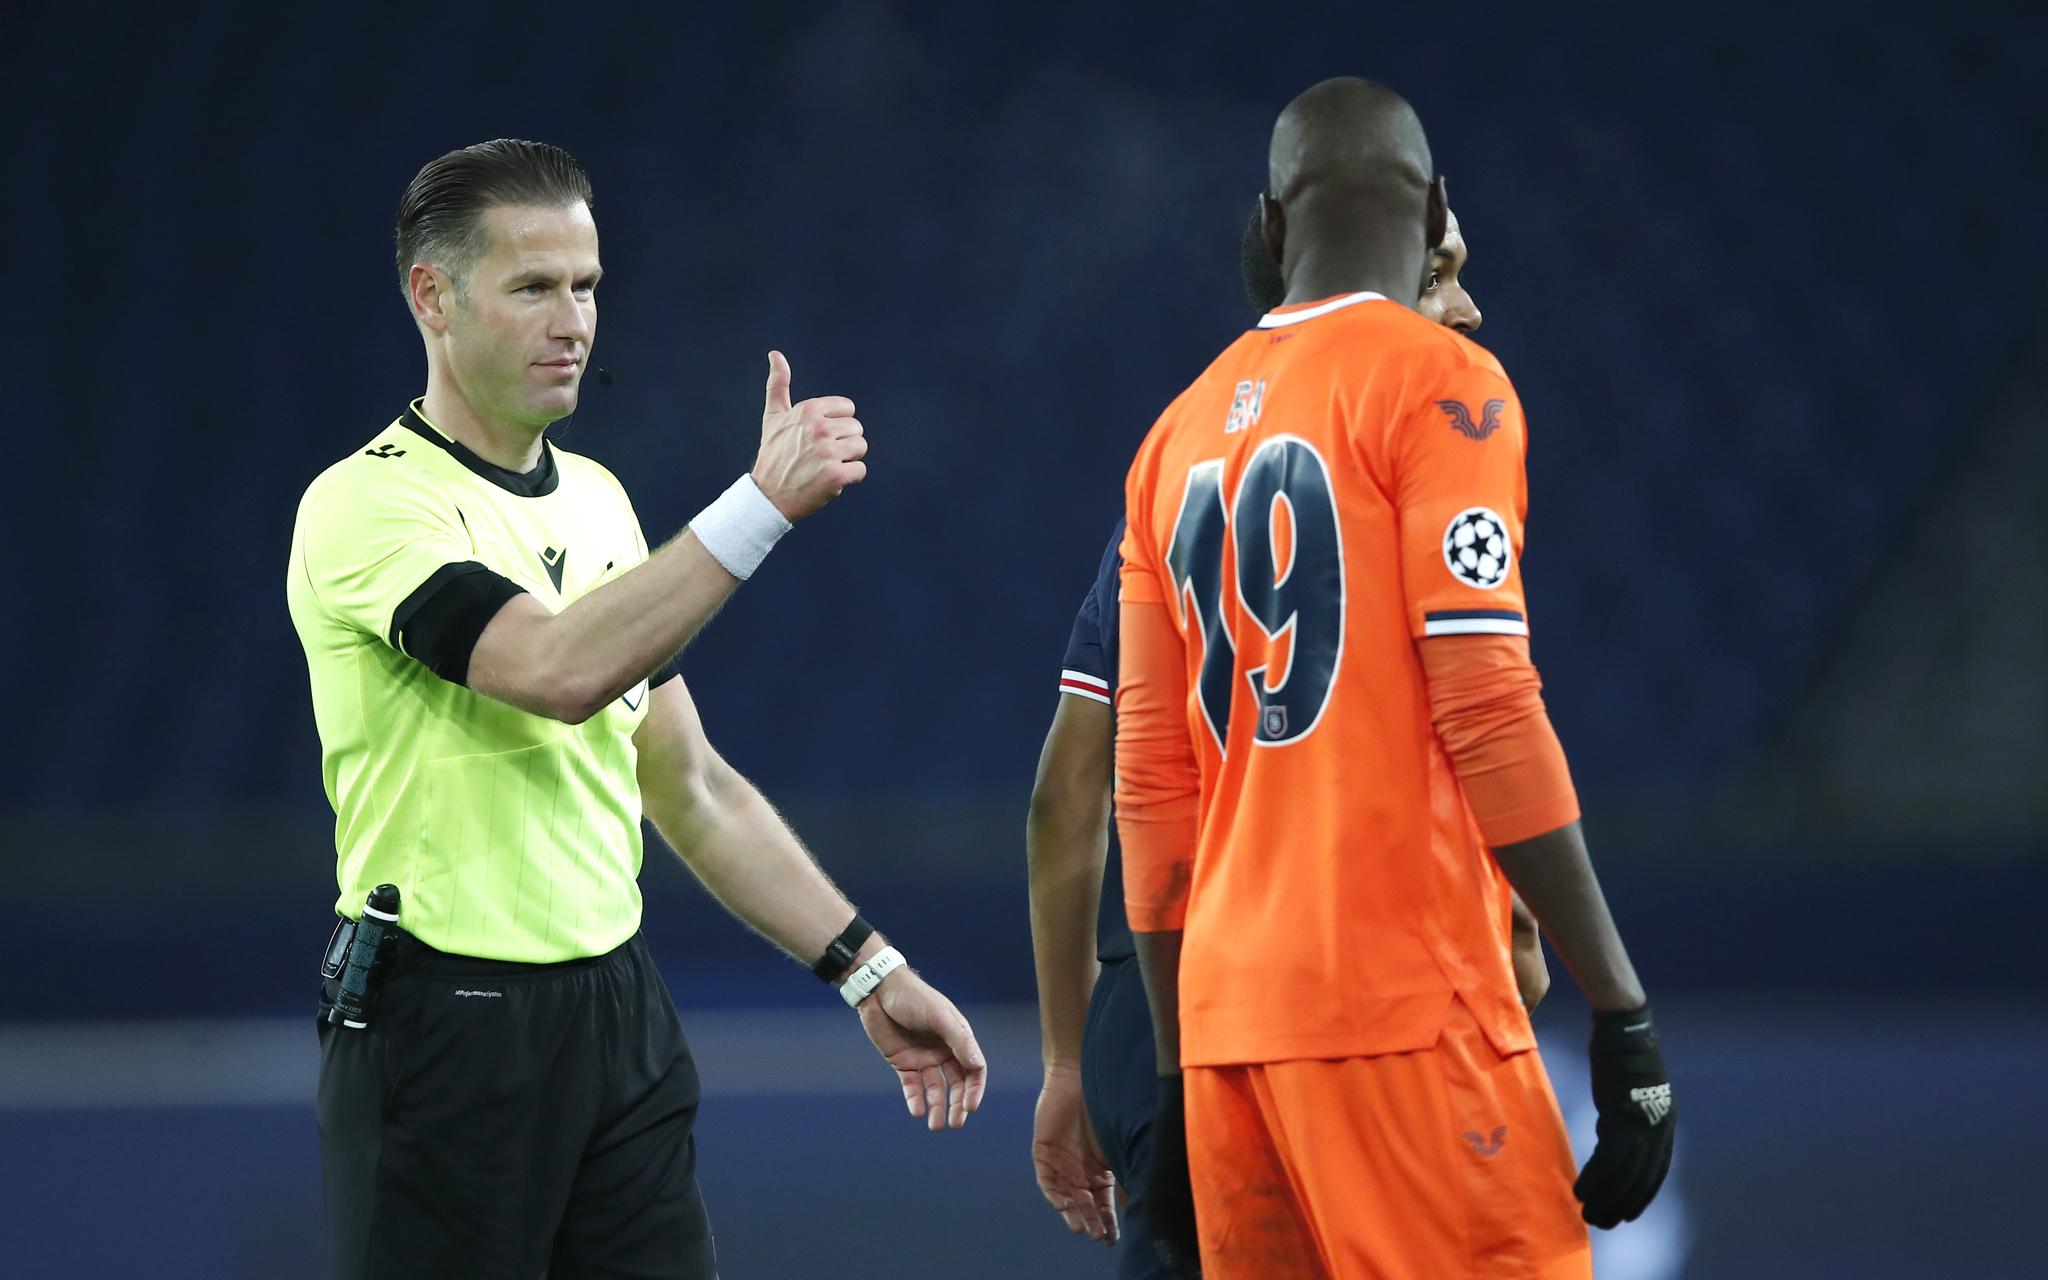 Danny Makkelie gives a thumbs up to Basaksehir's Demba Ba